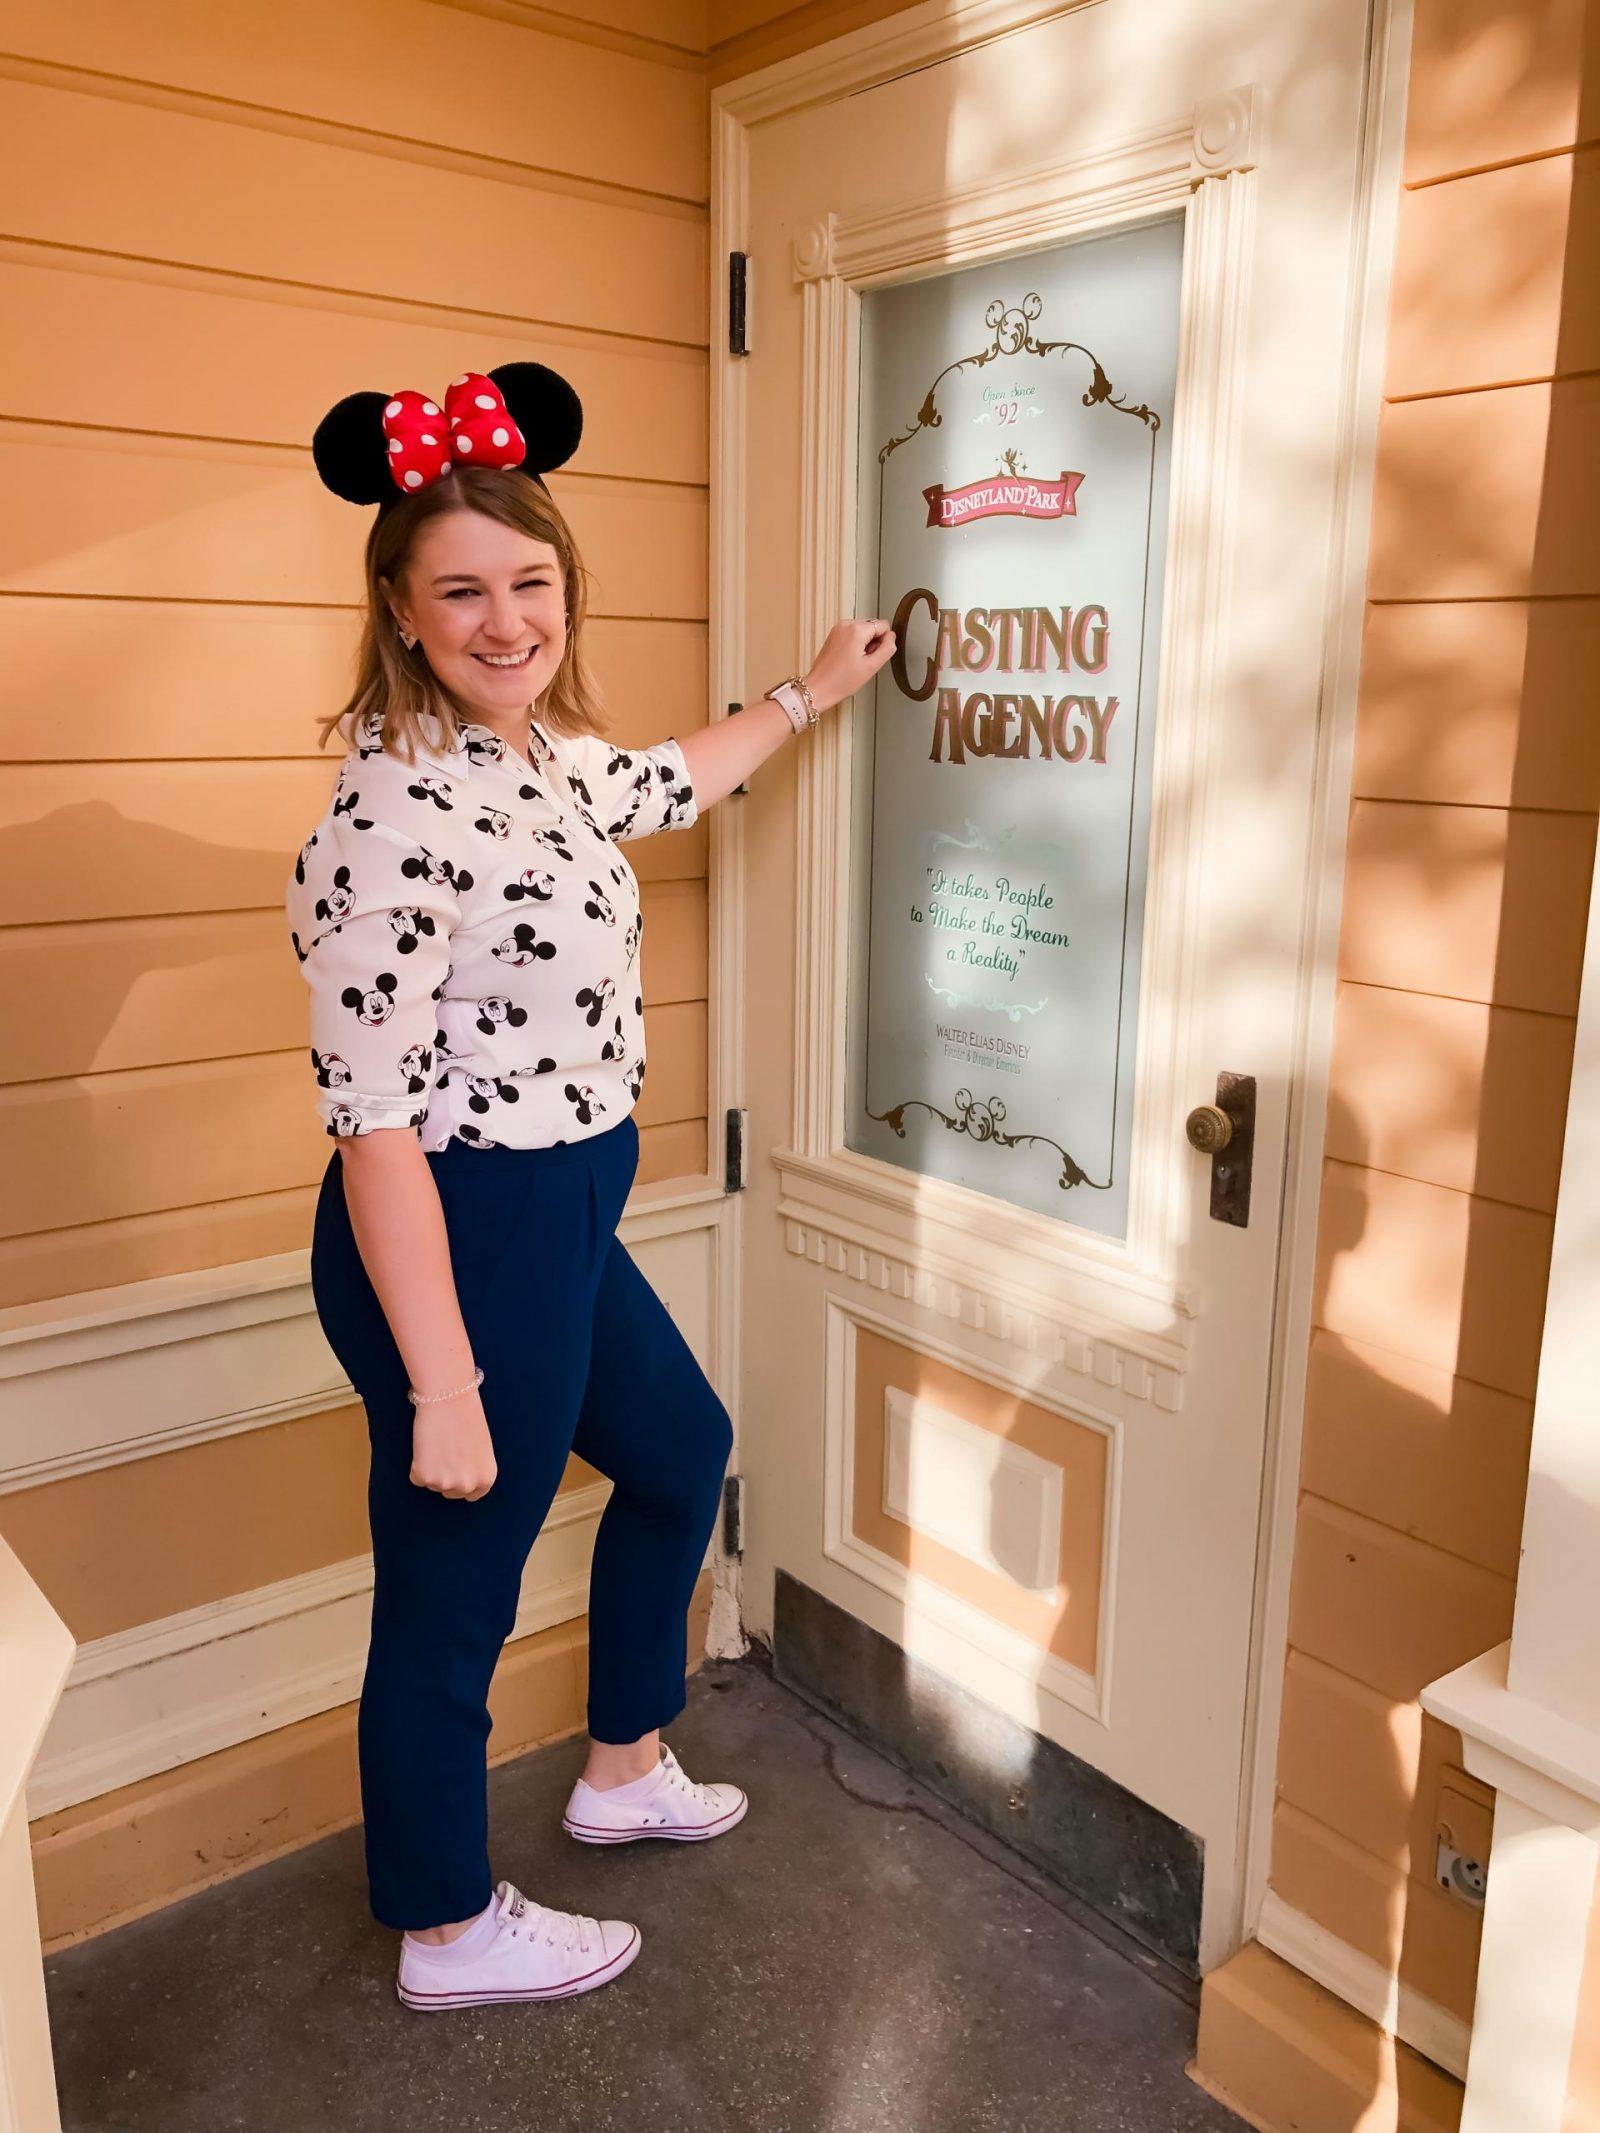 Casting Door - one of the most Instagrammable spots at Disneyland Paris